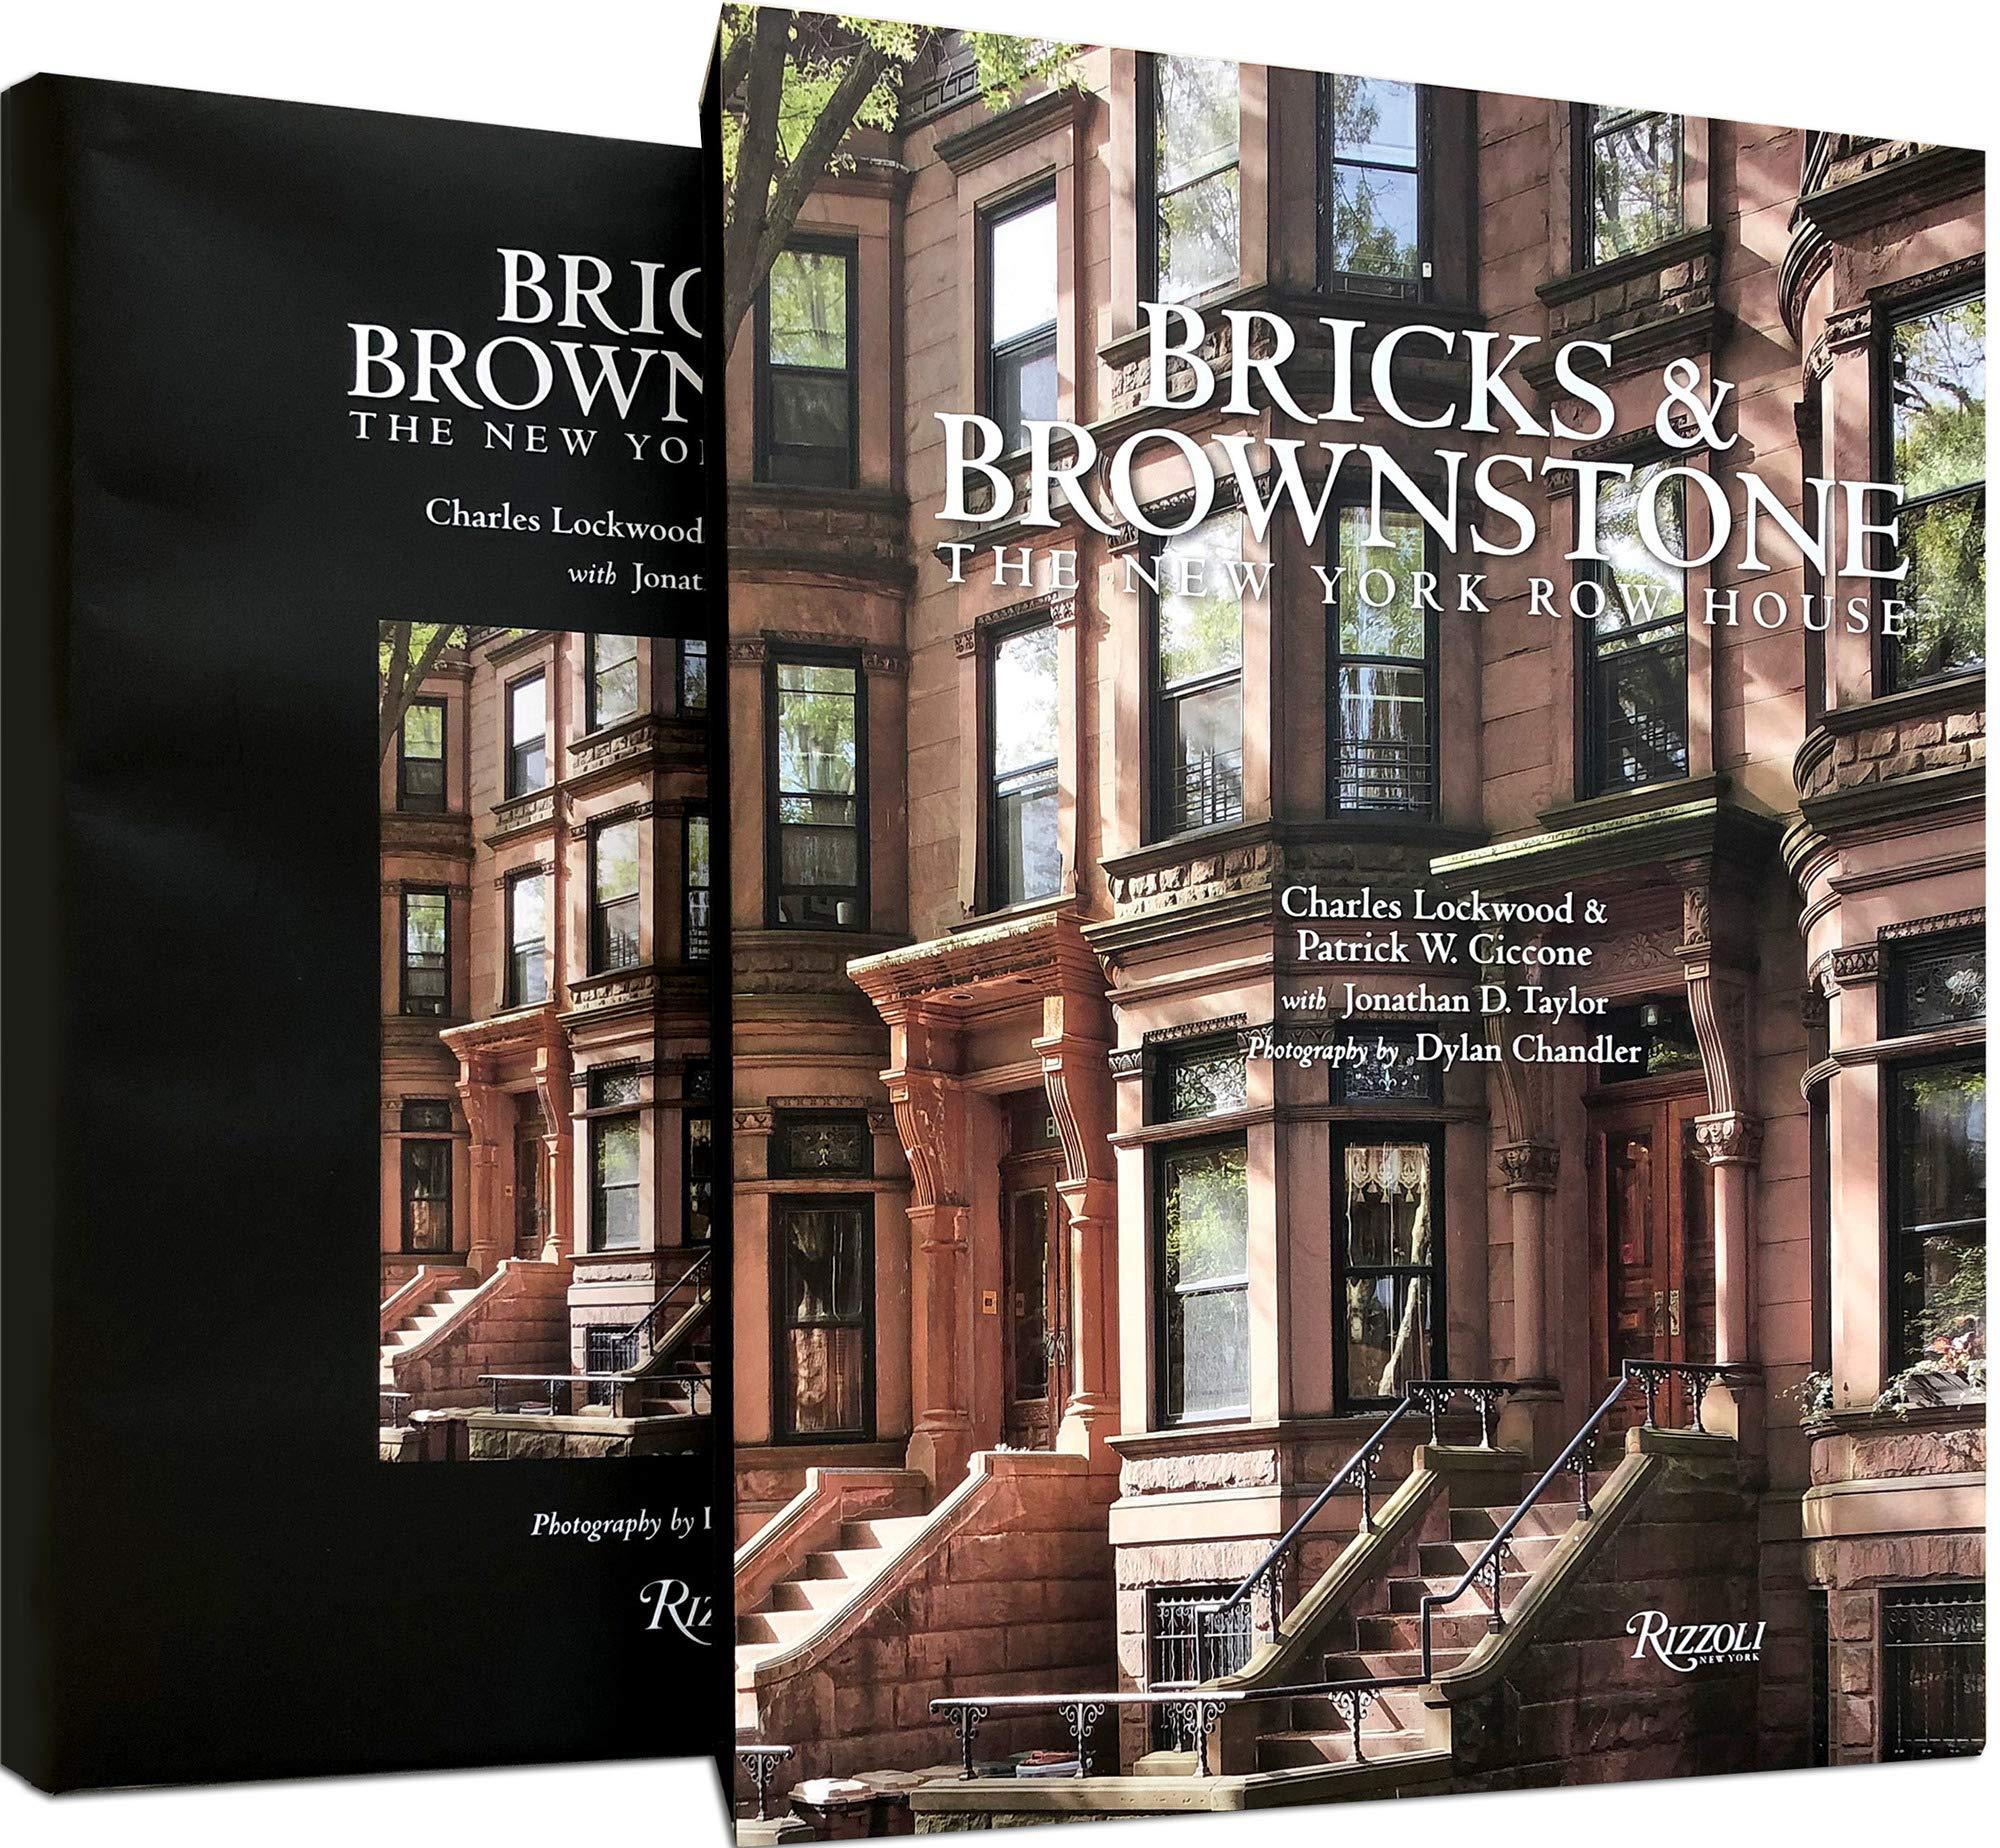 Bricks & Brownstone: The New York Row House by Rizzoli